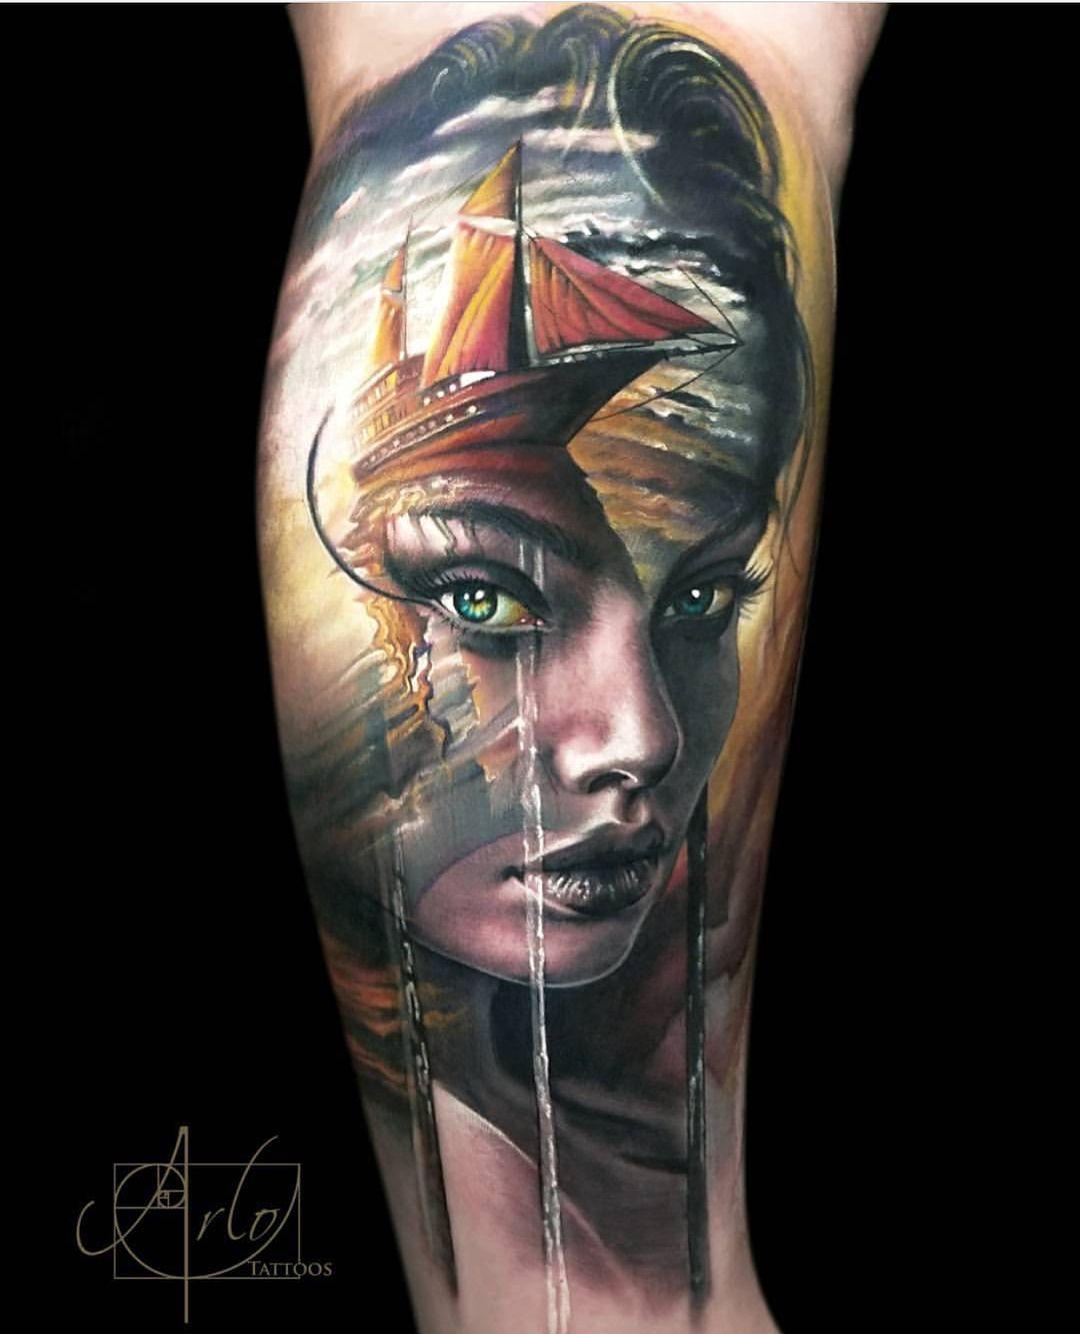 shine tattoo artist ig